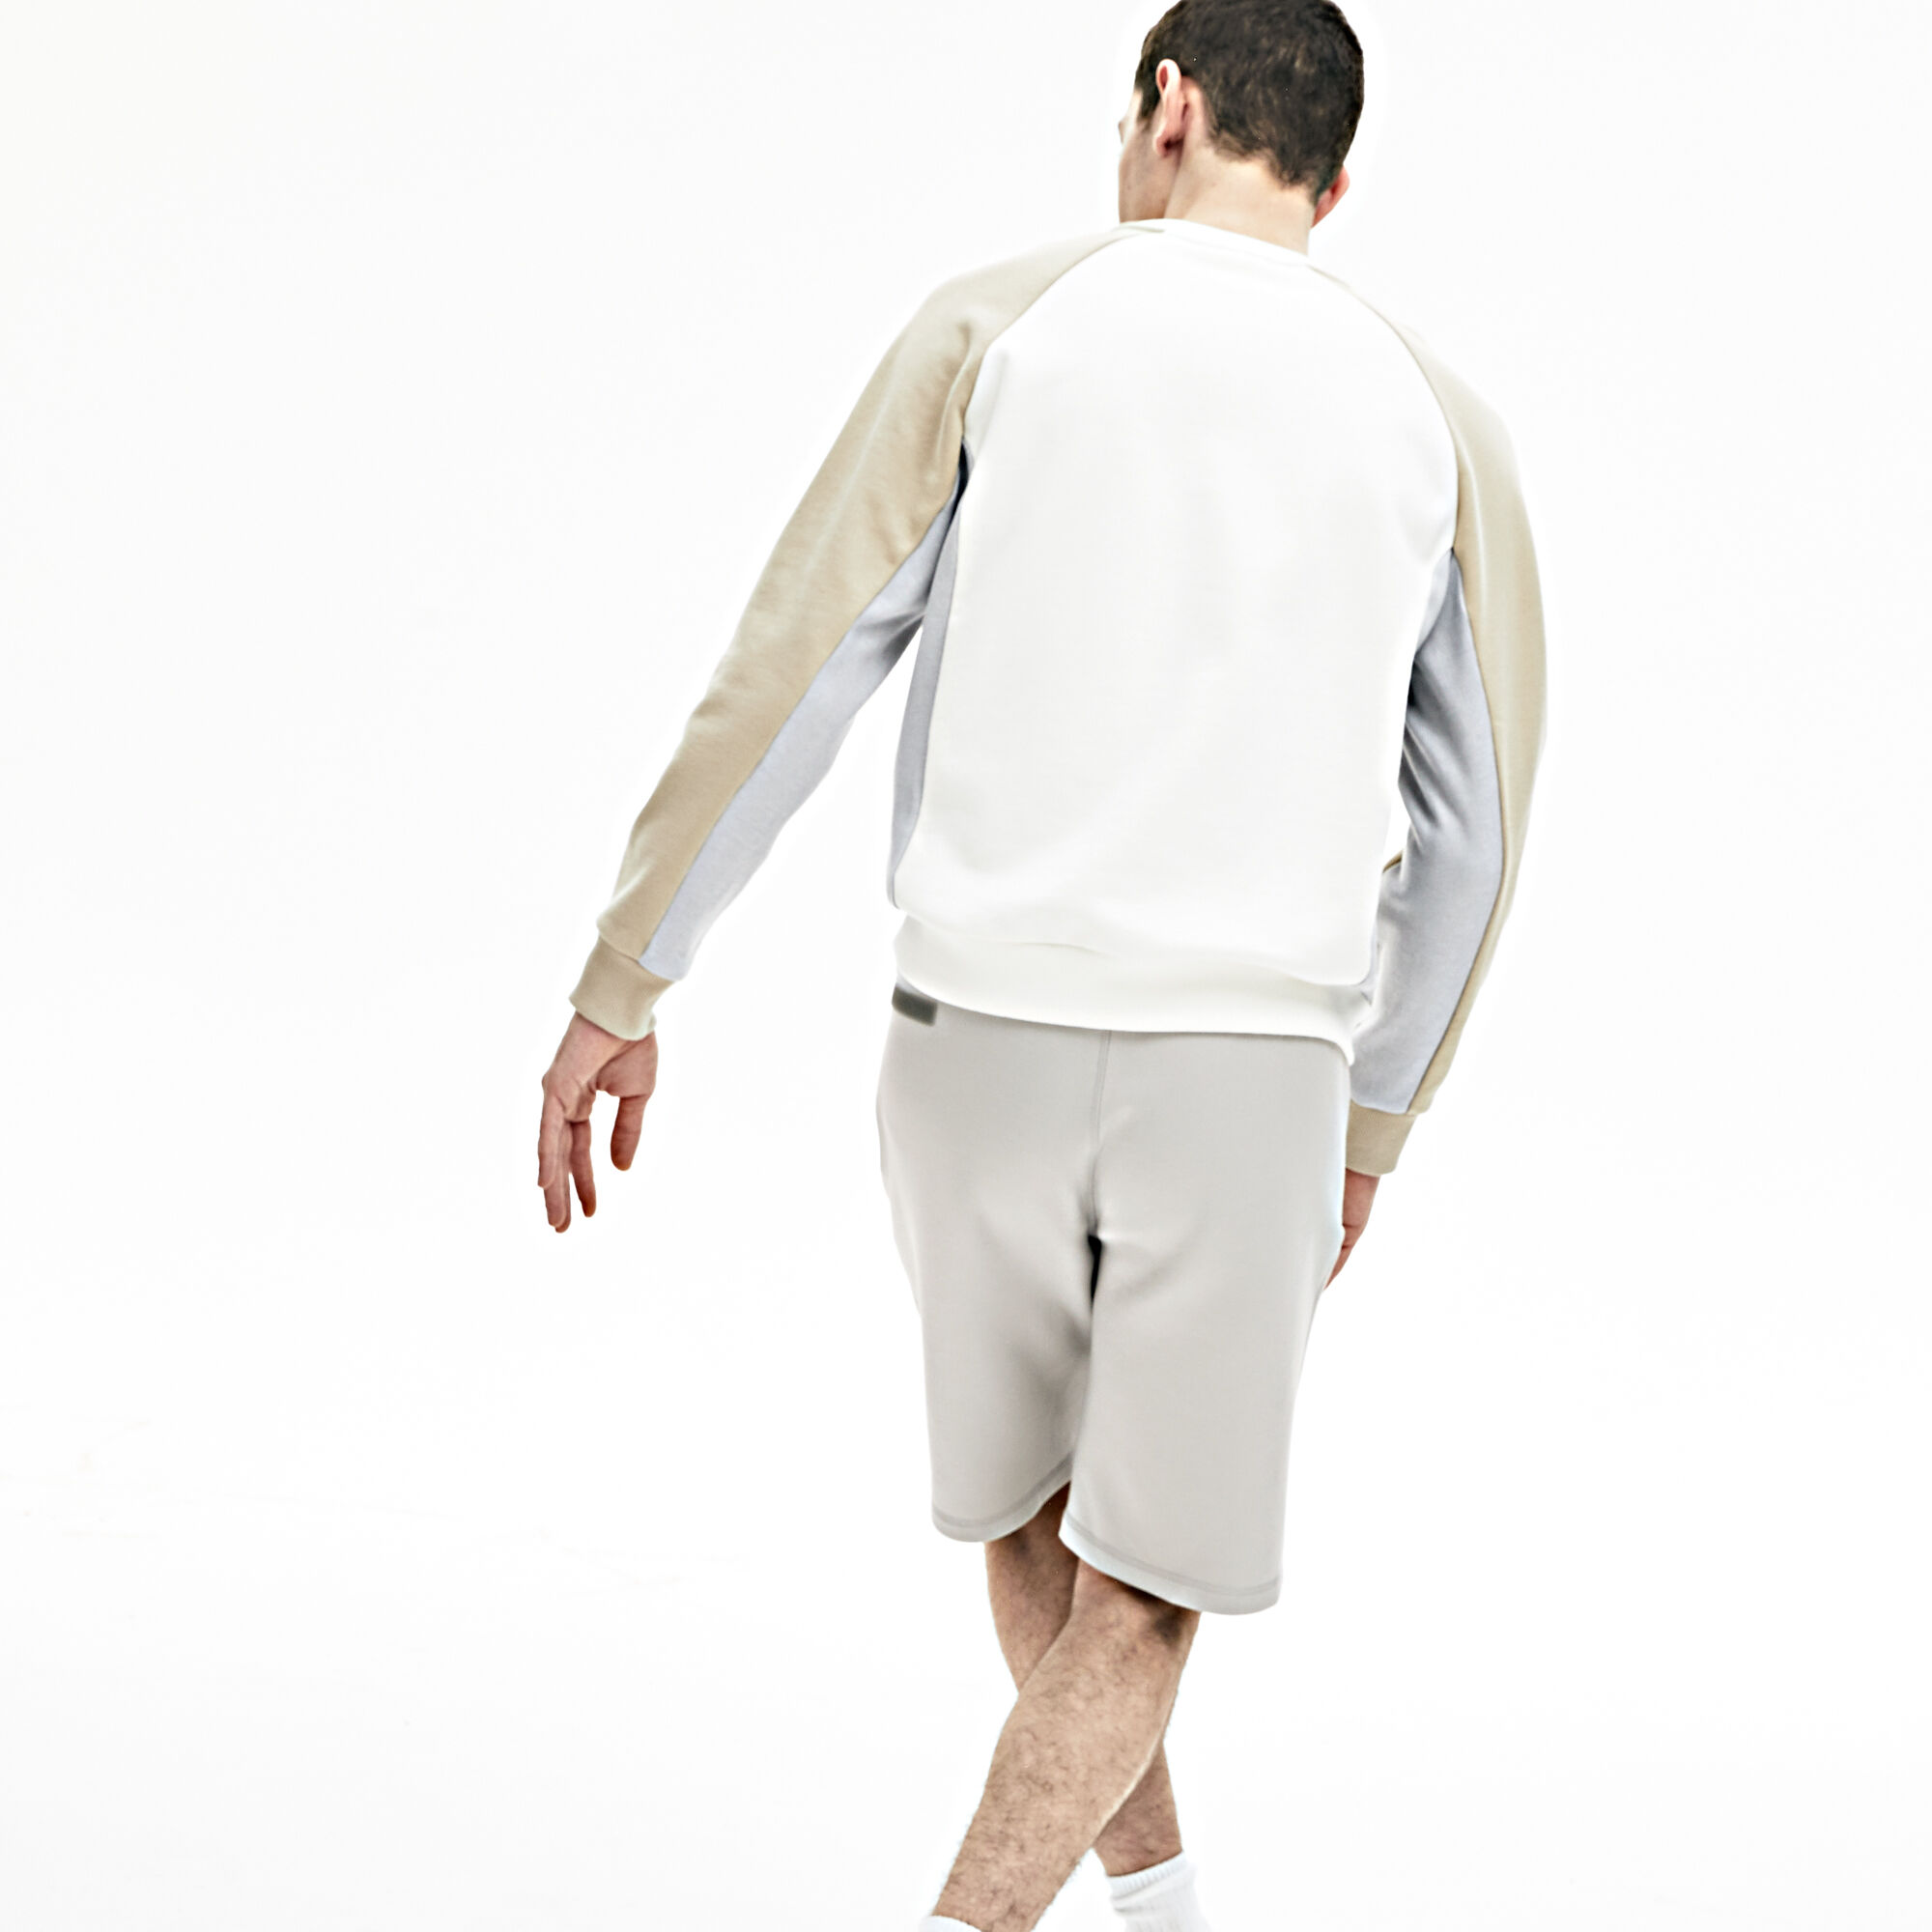 Men's Lacoste Motion Stretch Cotton Bermuda Shorts